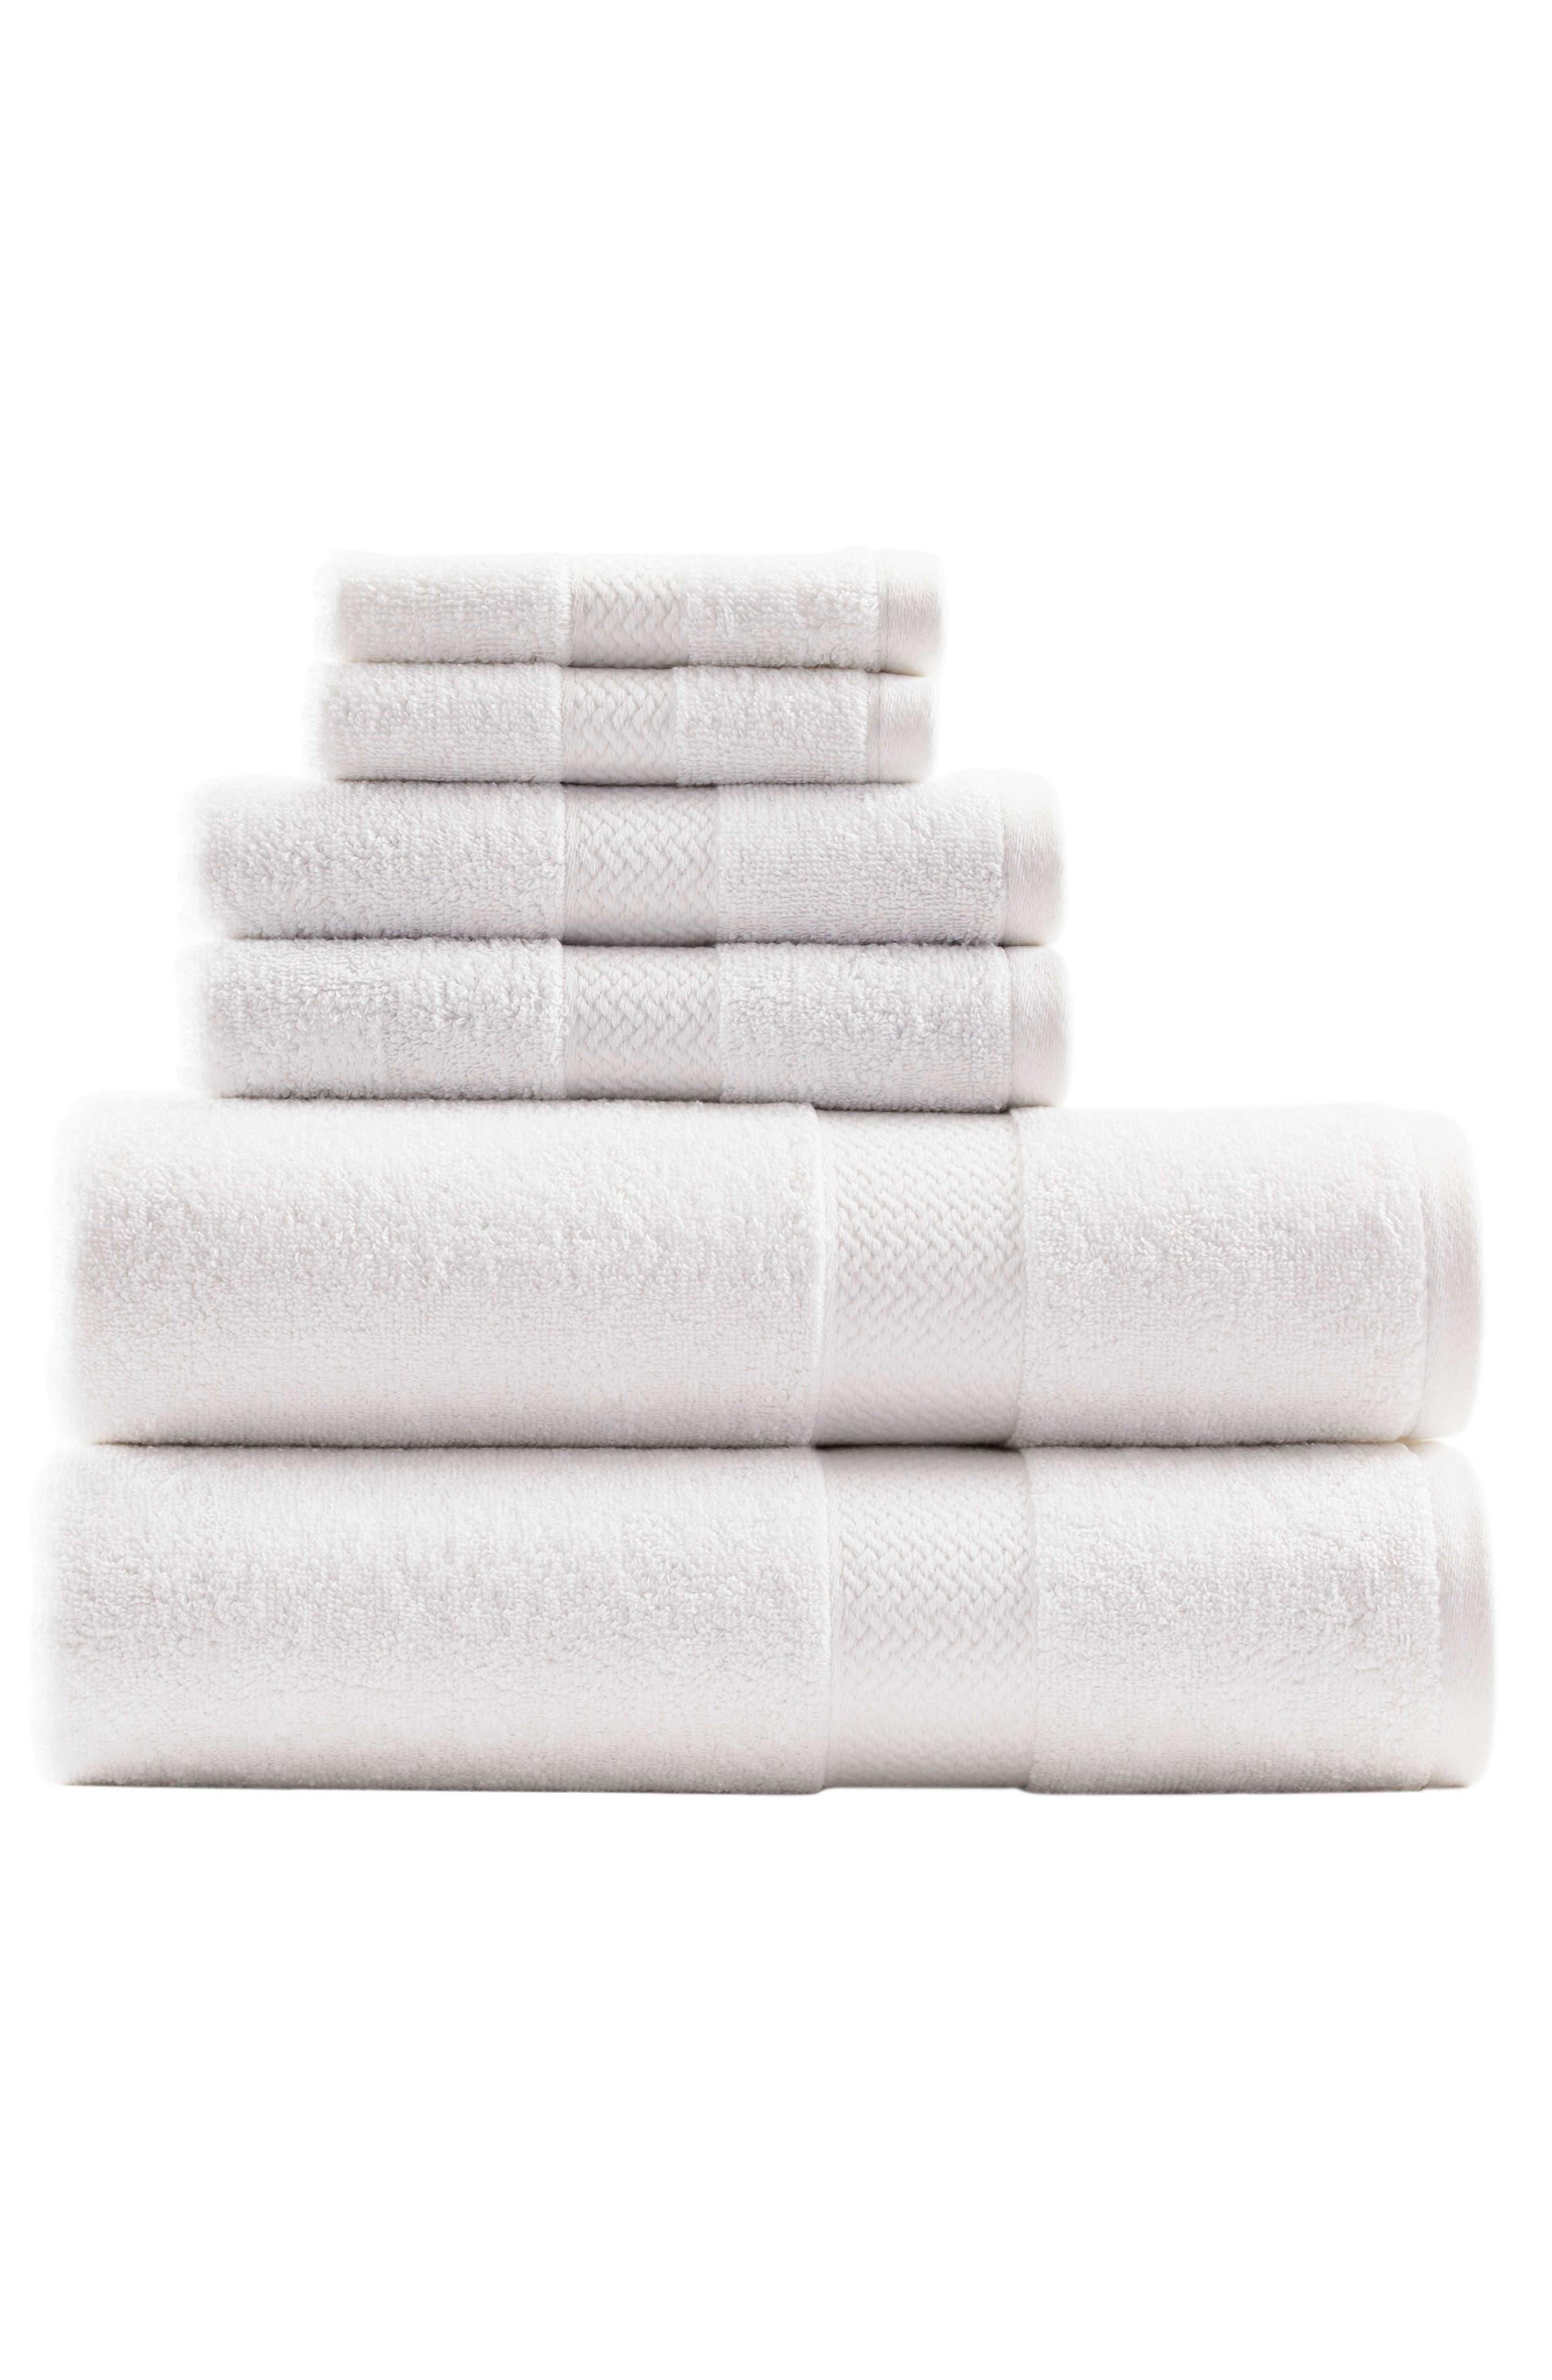 Cypress Bay 6-Piece Towel Set, Main, color, WHITE